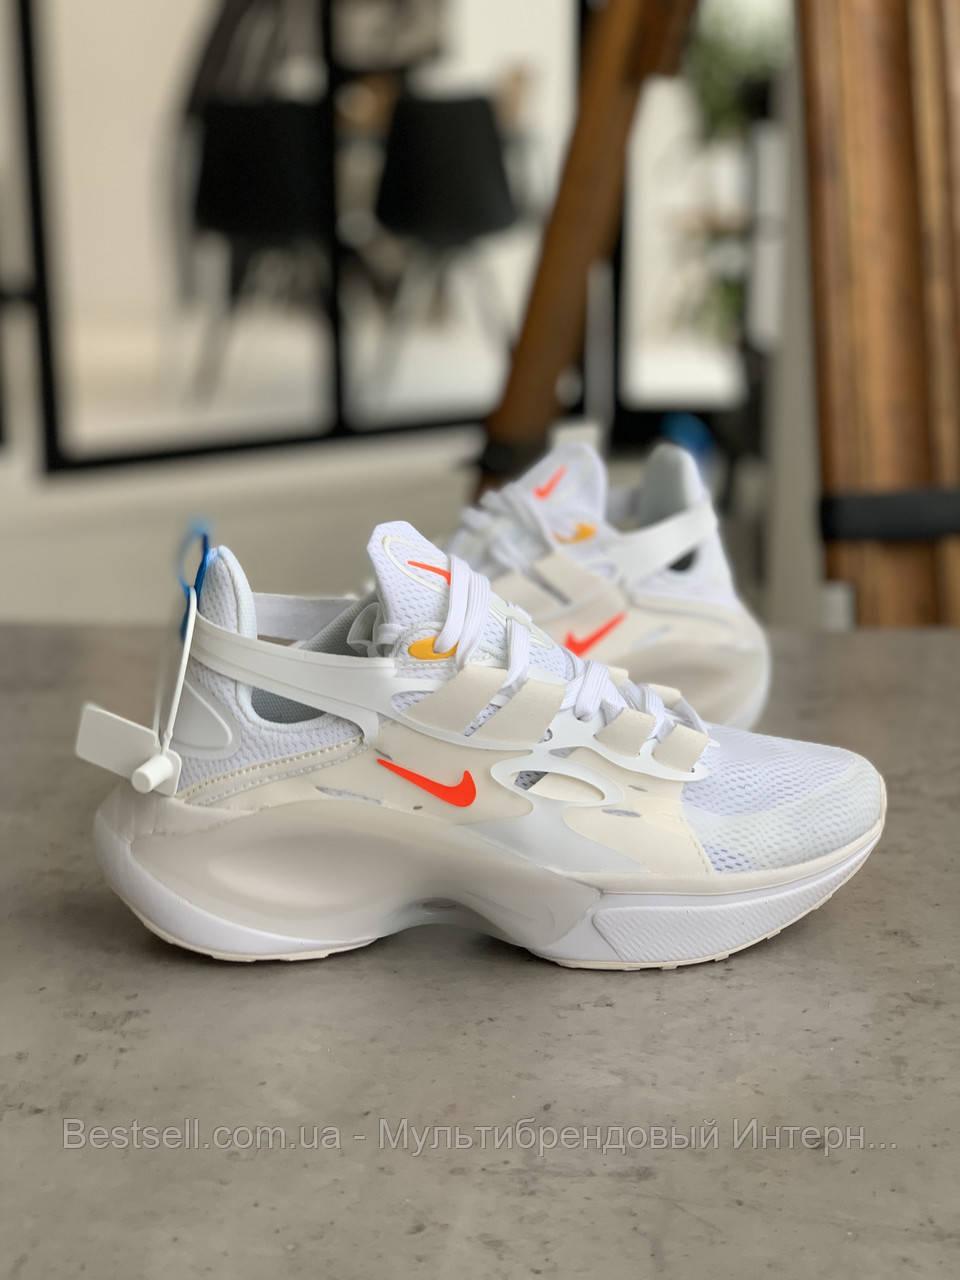 Кроссовки женские Nike Signal D White Найк Сигнал Д Белые (36,40)